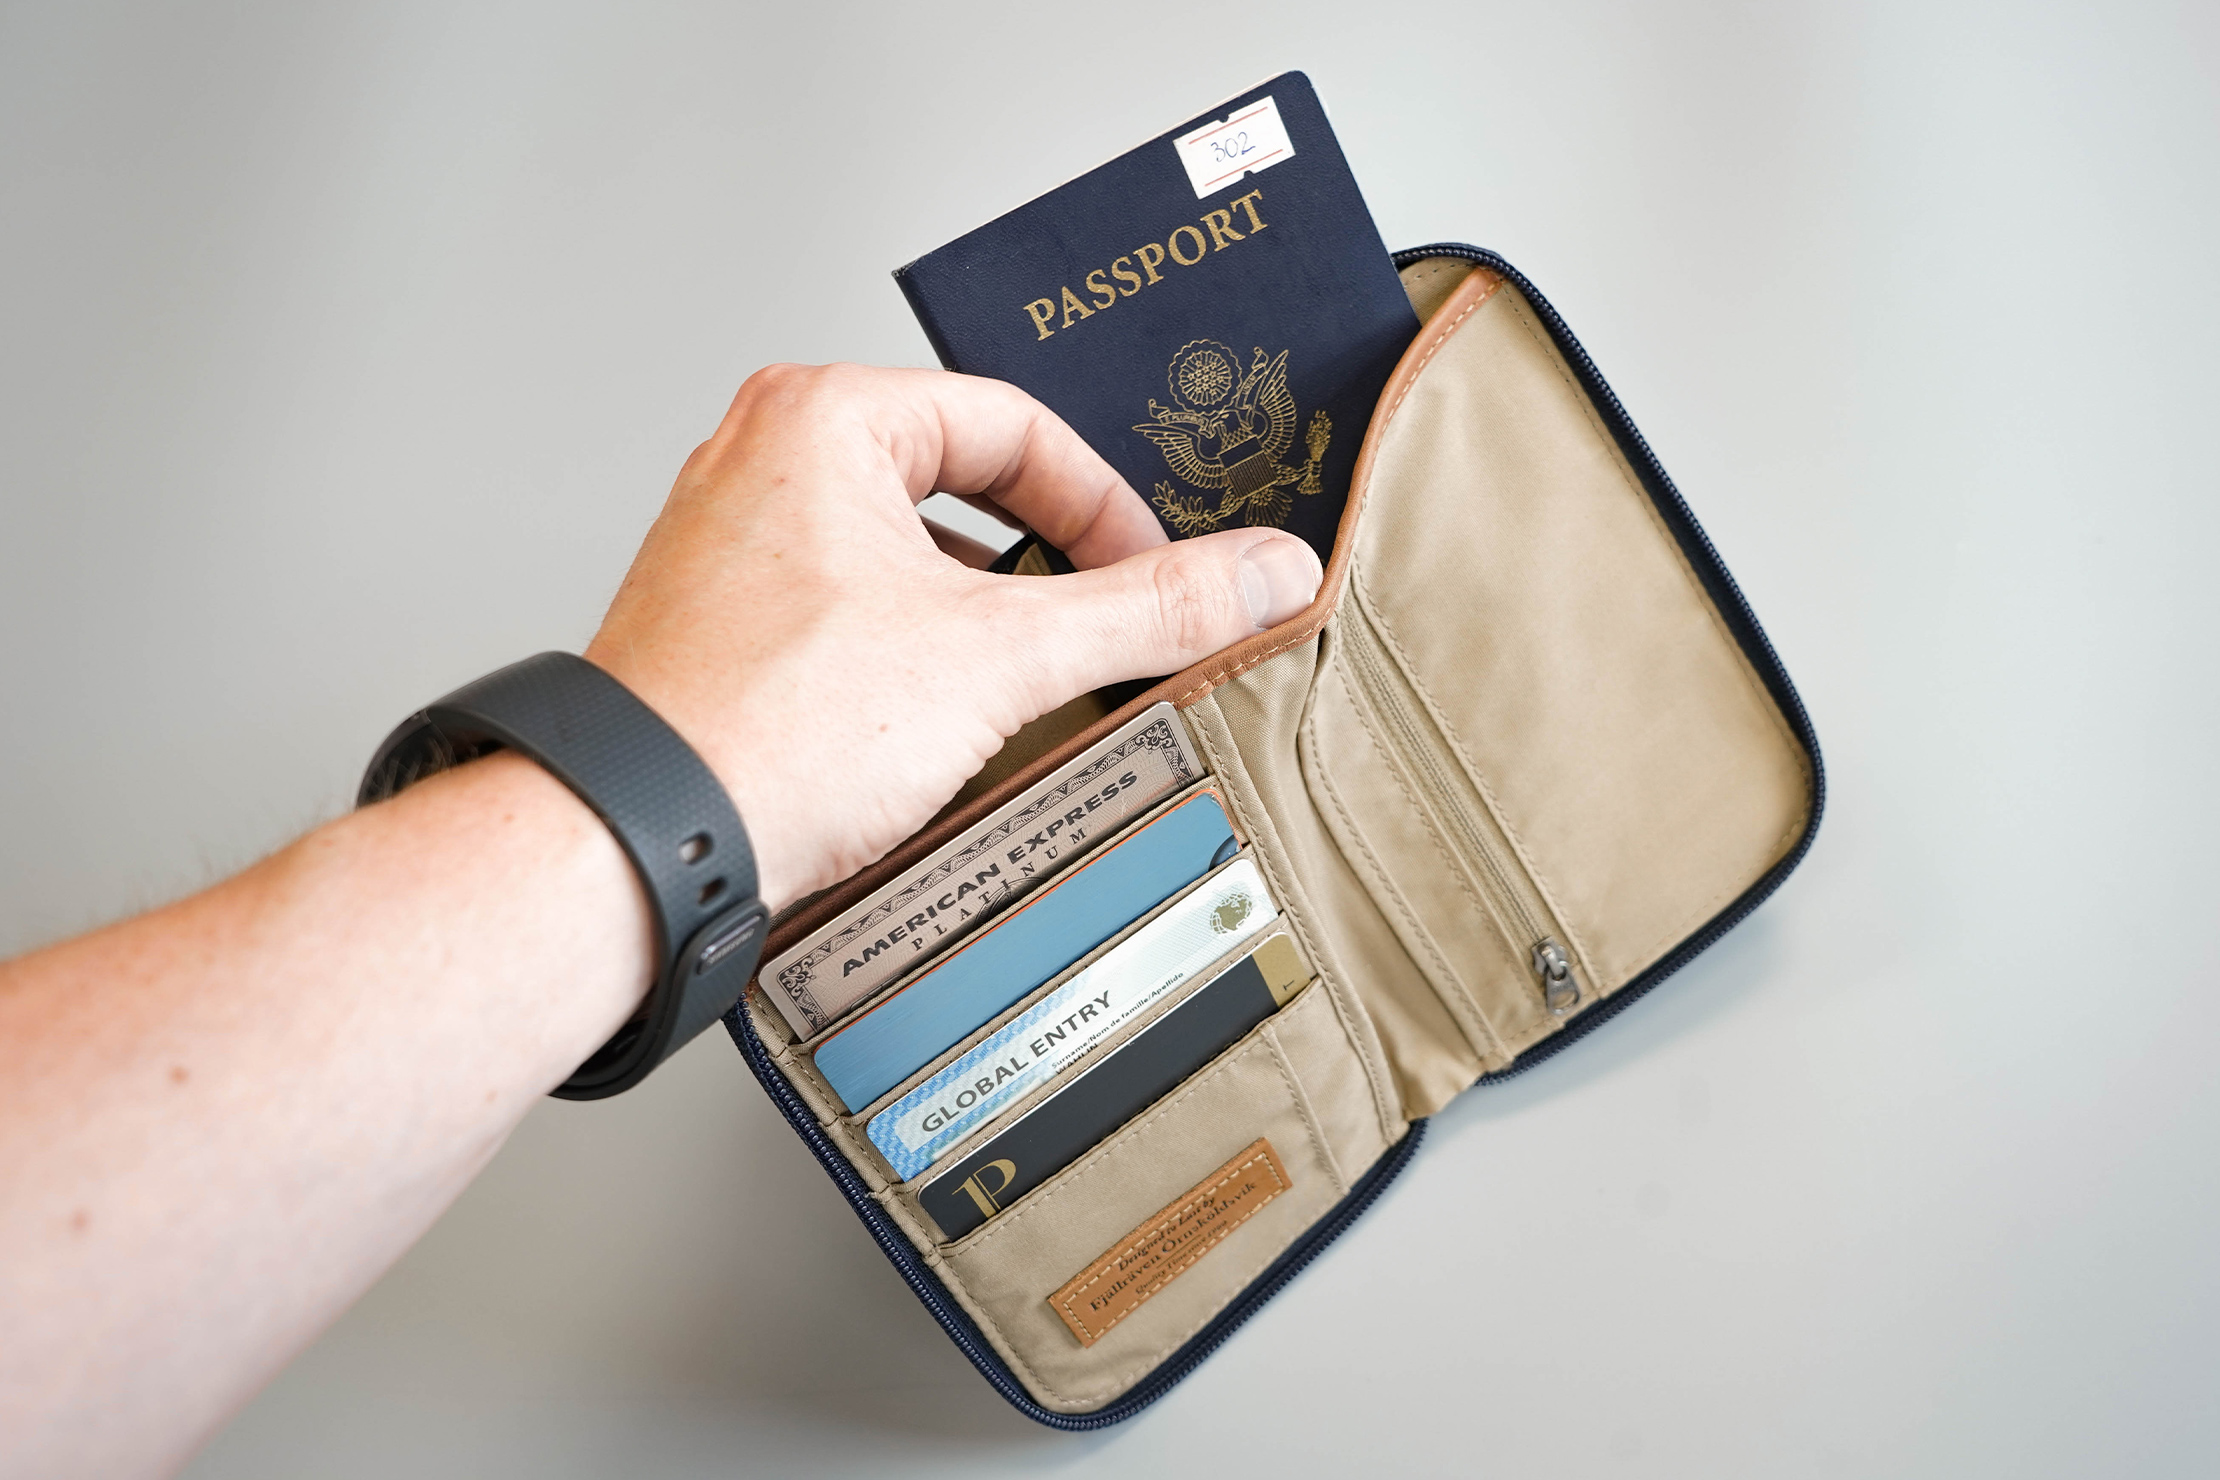 Fjallraven Passport Wallet Back Passport Pocket